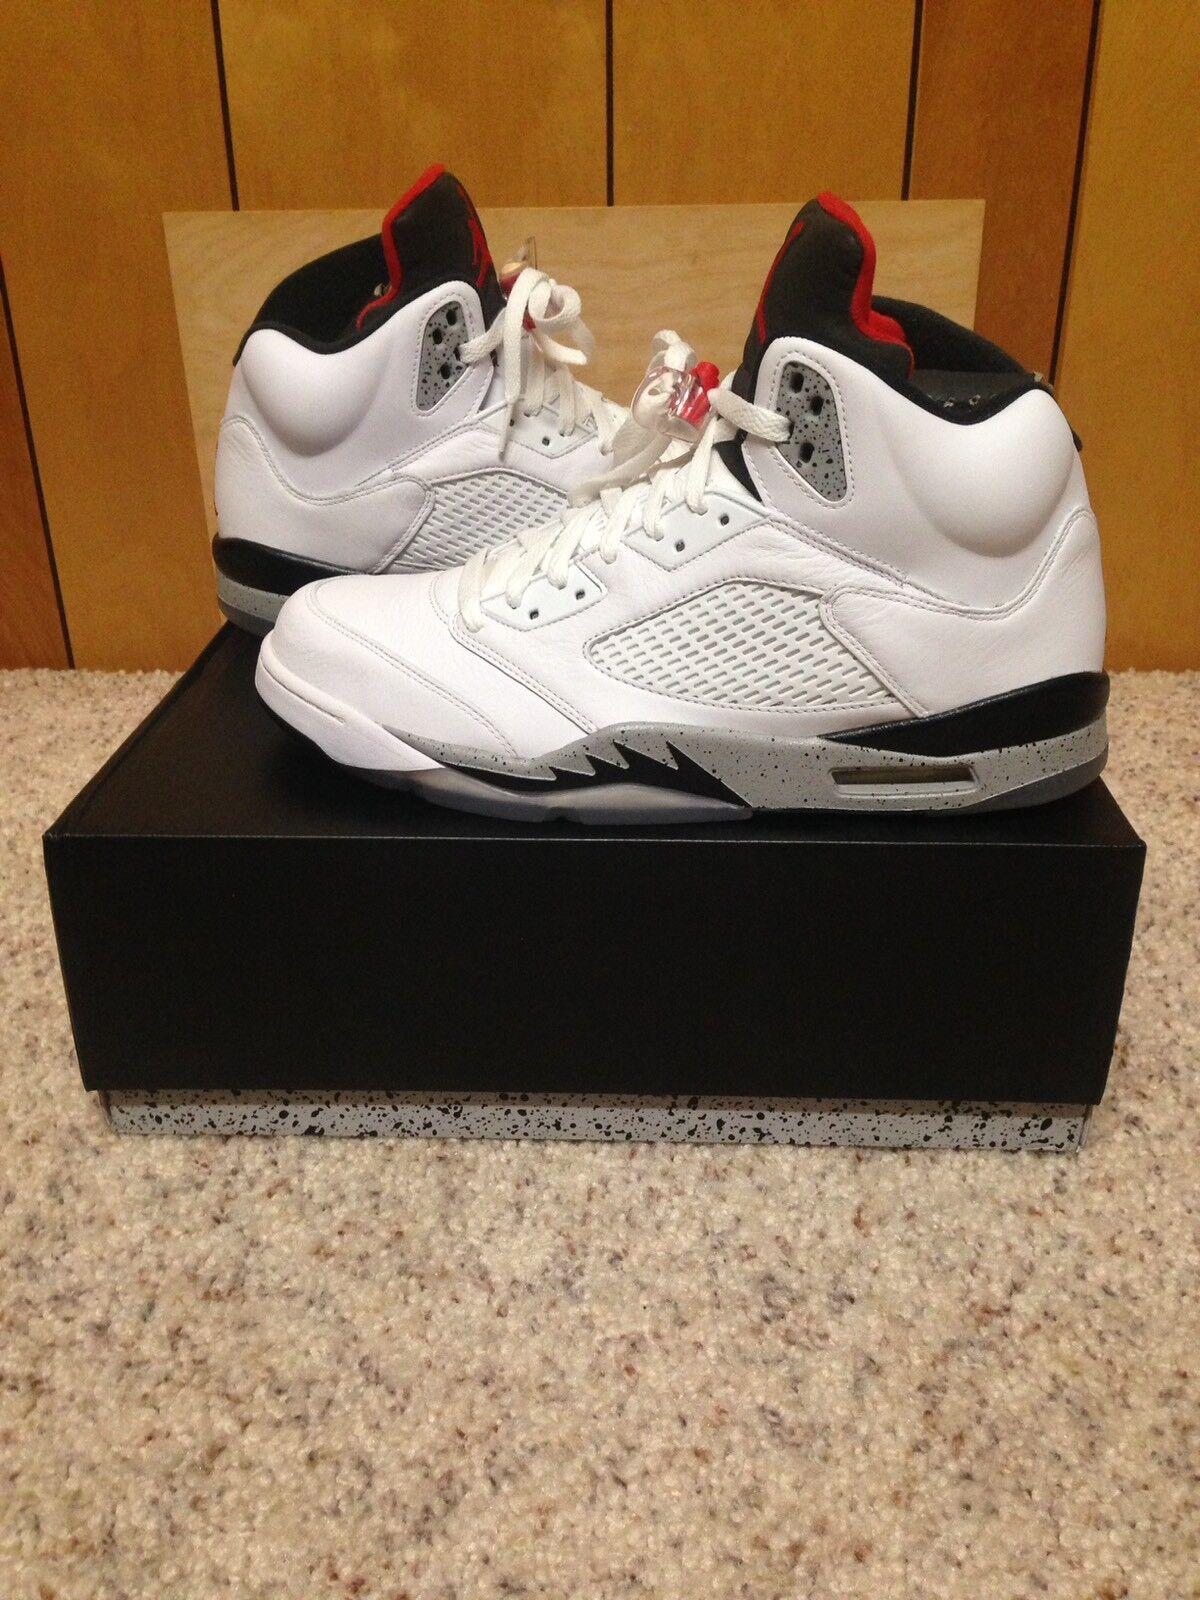 Jordan 5 Retro Size 13 White University Red-Black